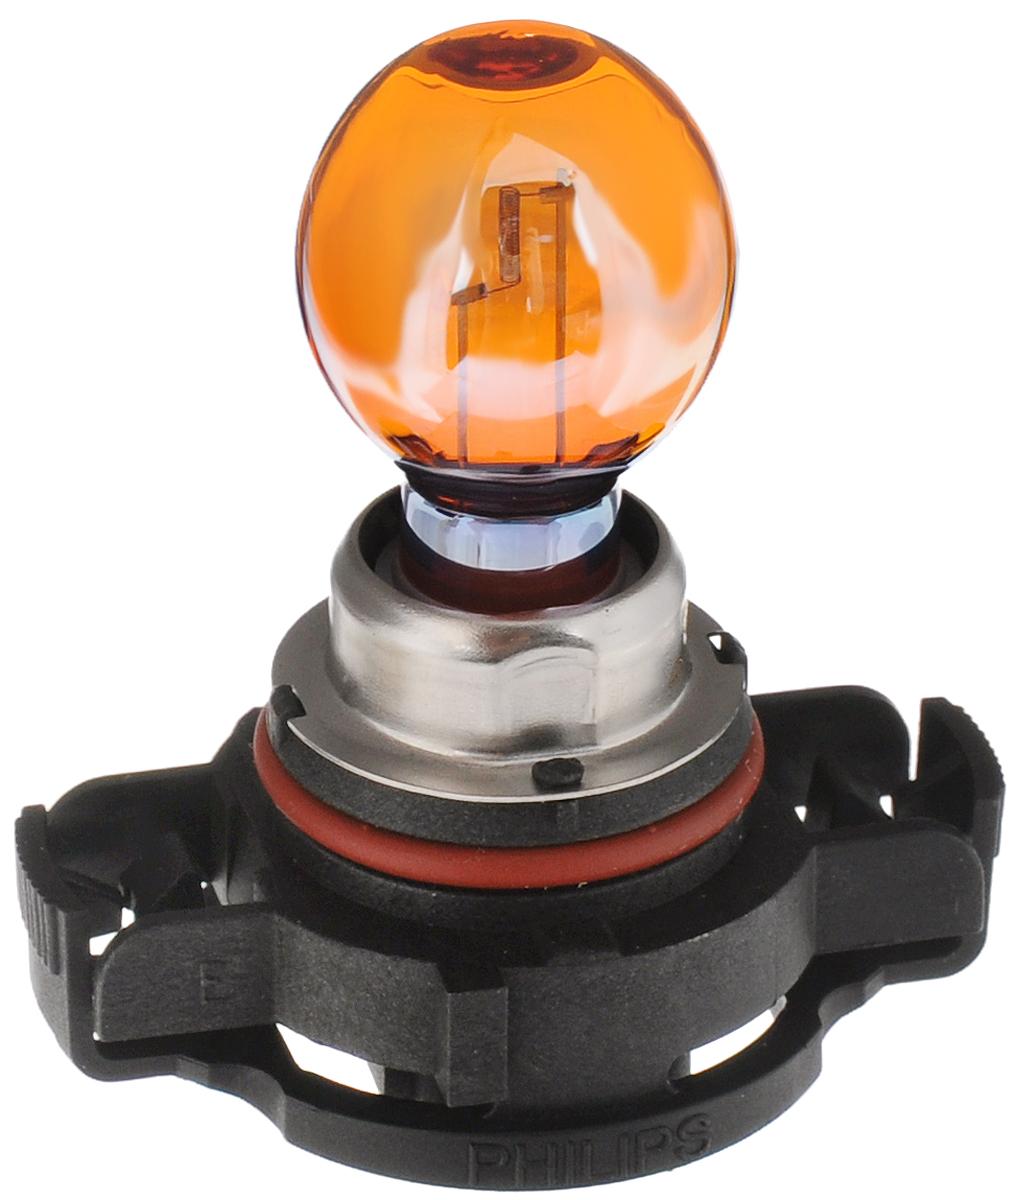 Лампа Доп. Освещ. Standard 12v Psy24w